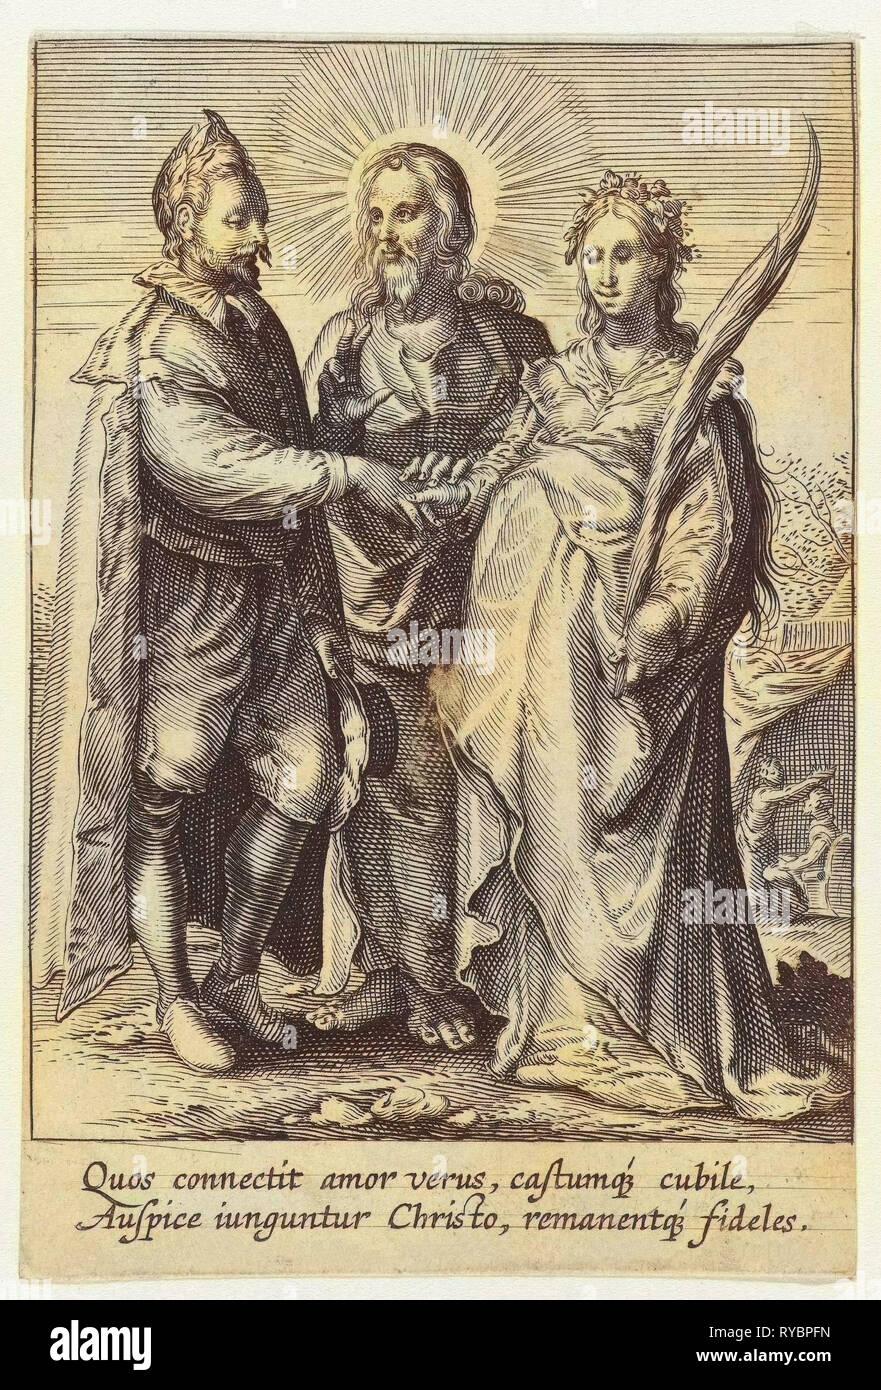 Marriage of spiritual love, Jan Saenredam, Anonymous, Hendrick Goltzius, 1575-1657 - Stock Image